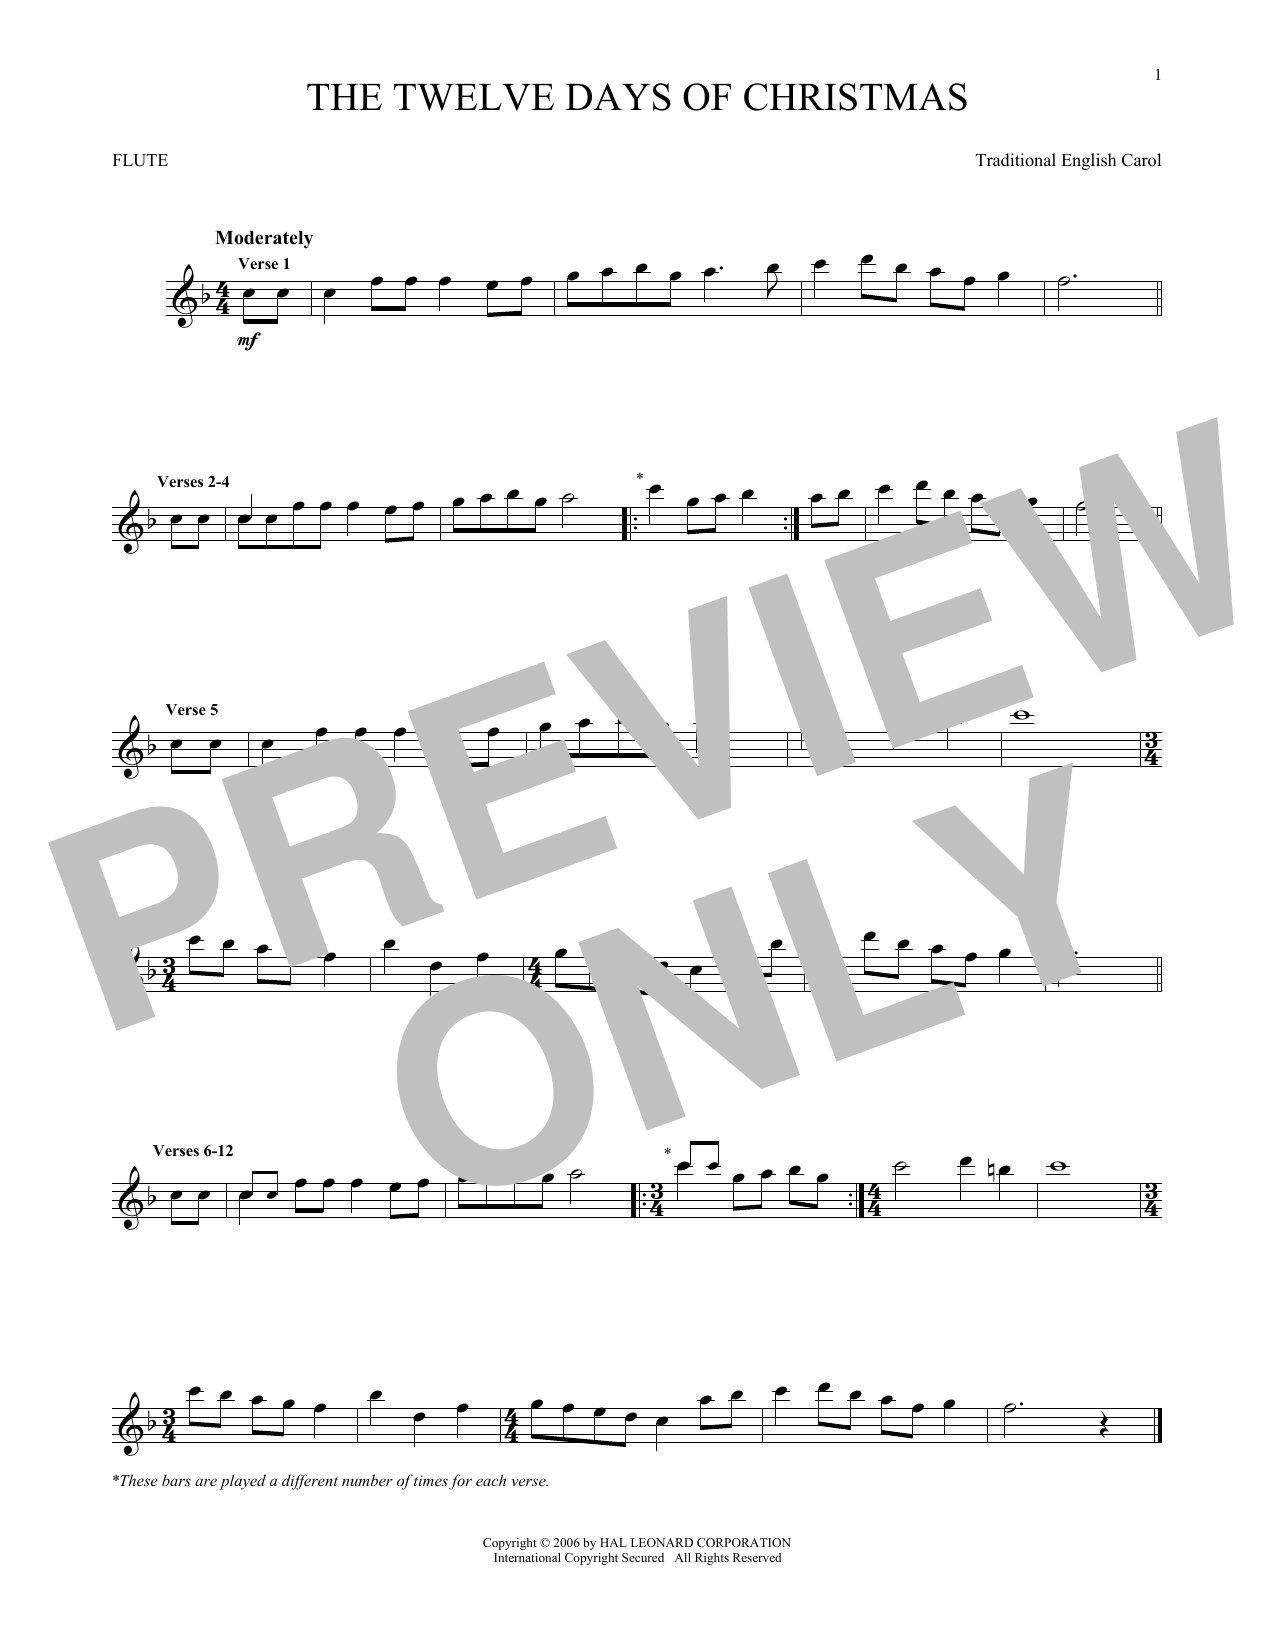 Partition flûte The Twelve Days Of Christmas de Traditional English Carol - Flute traversiere